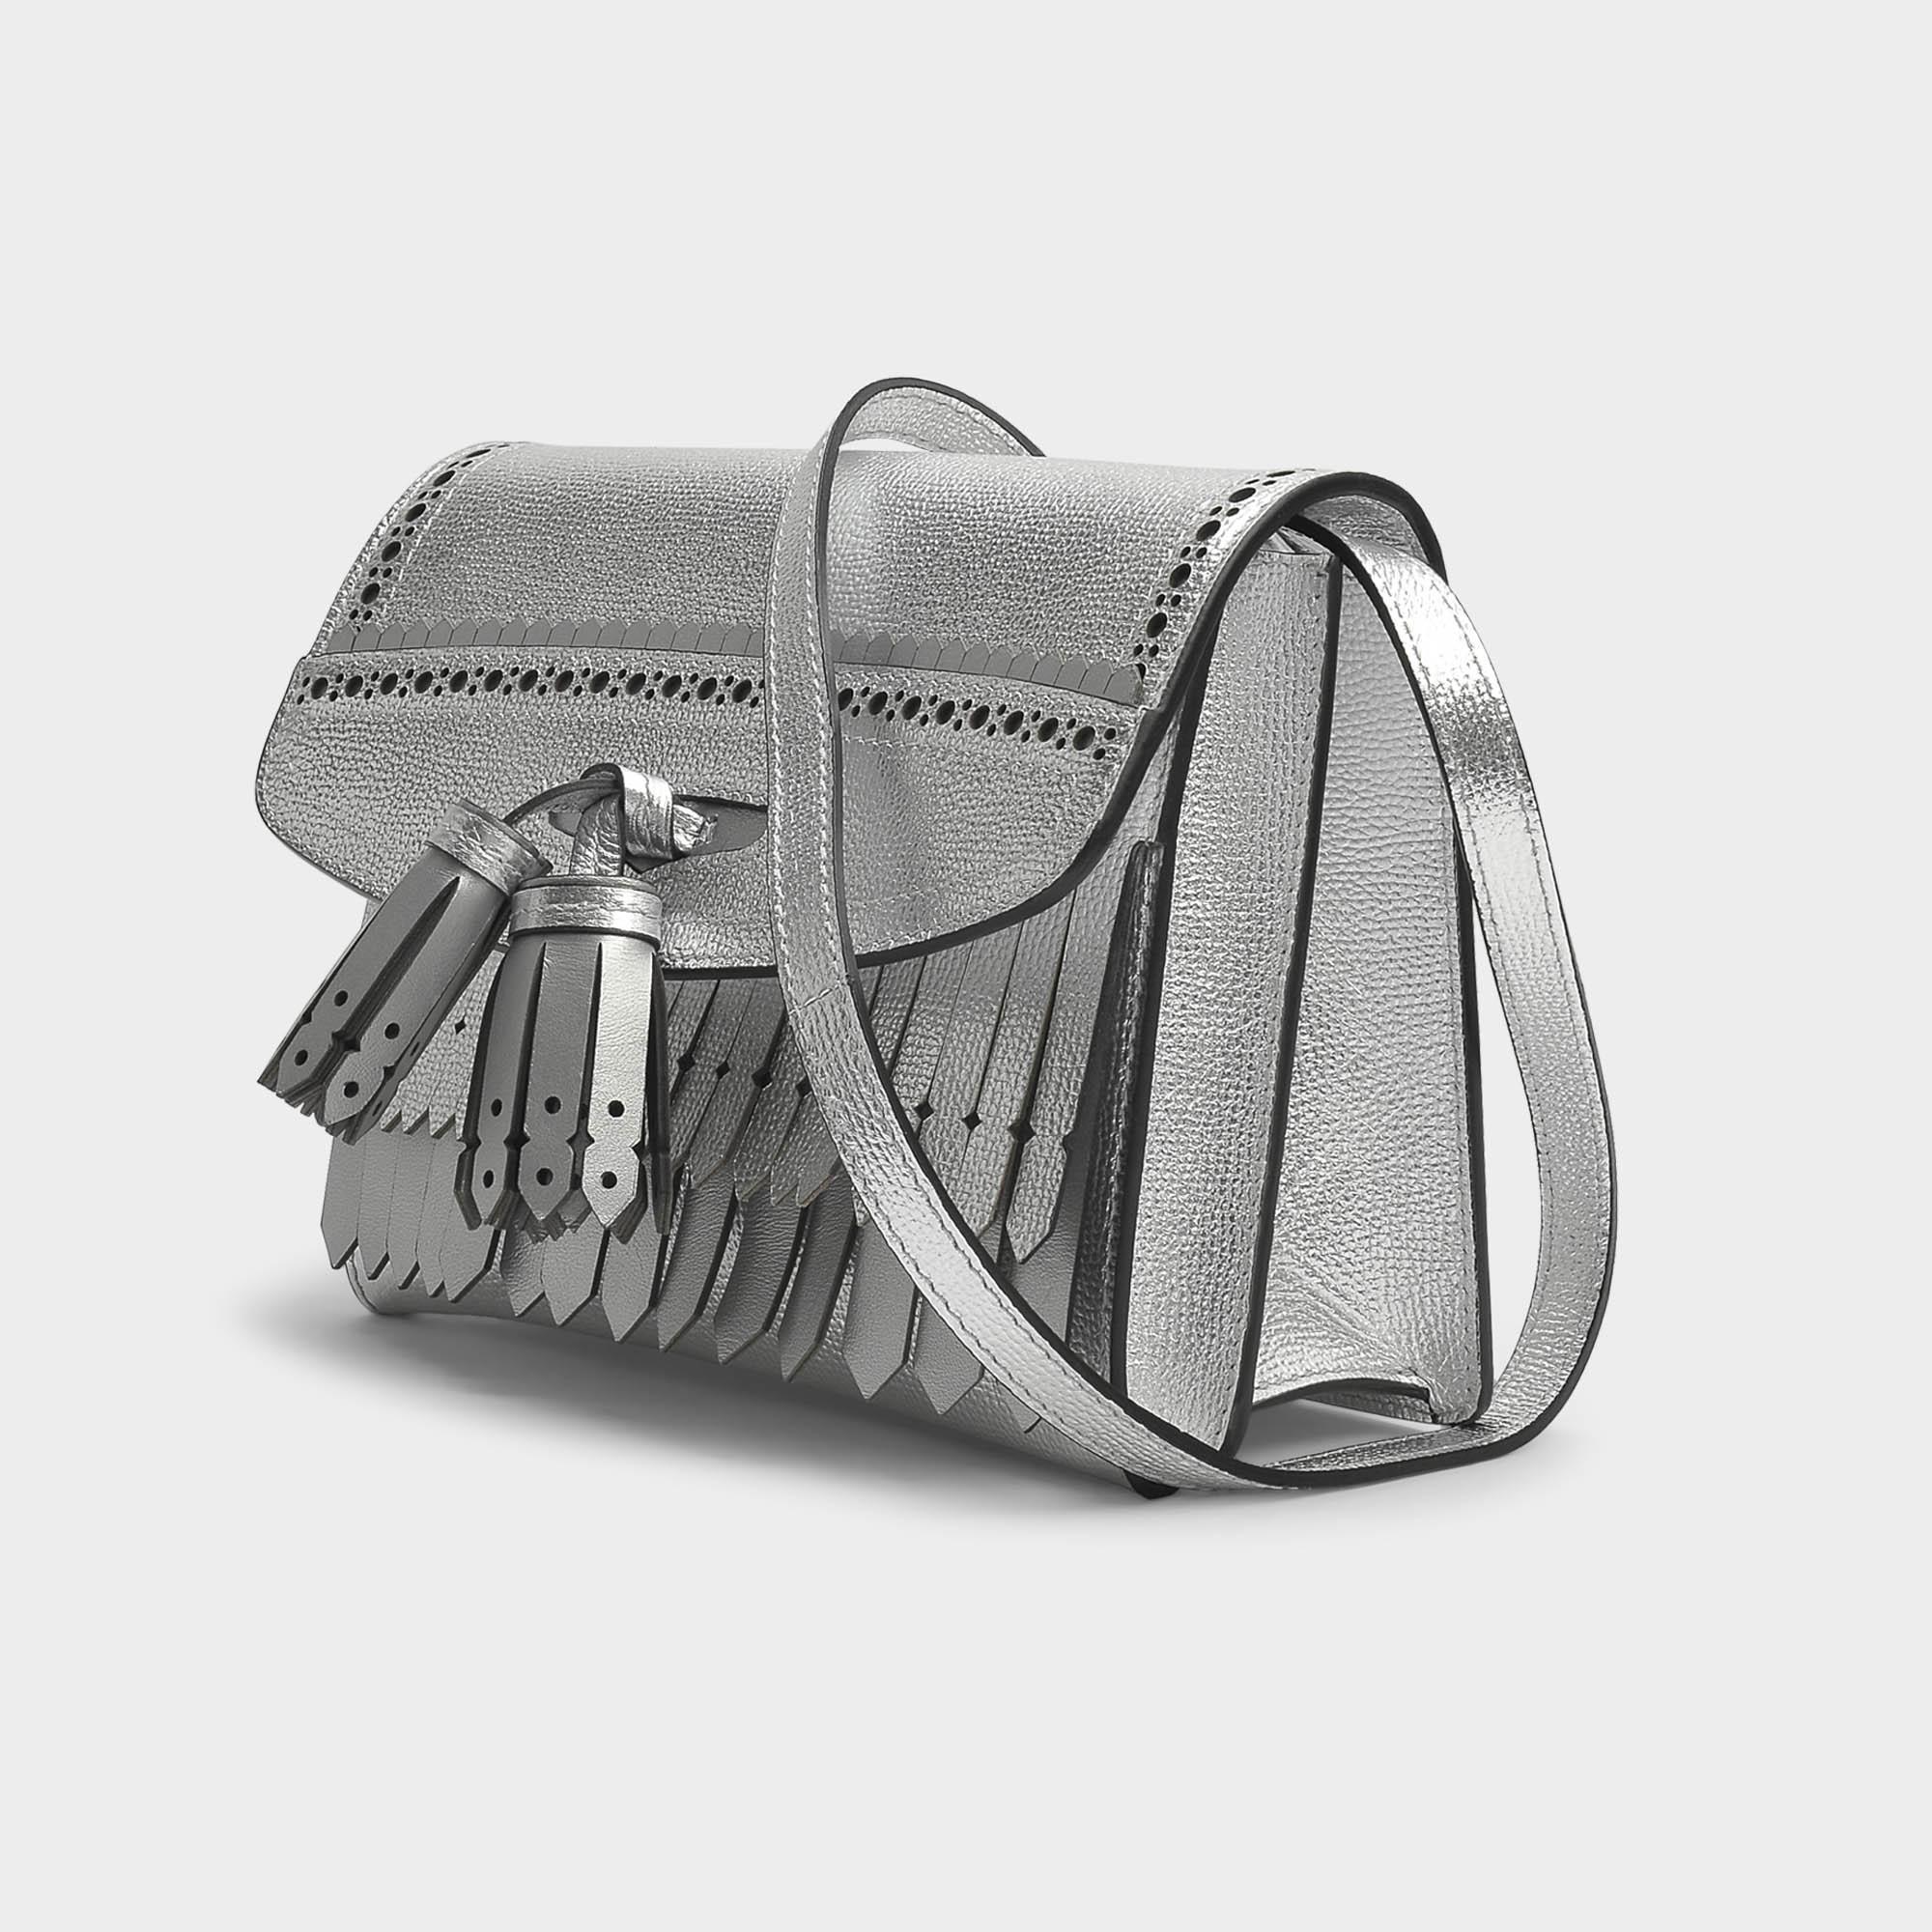 Lyst - Burberry Small Macken Crossbody Bag In Silver Metallic Calfskin cc0dc338ea509